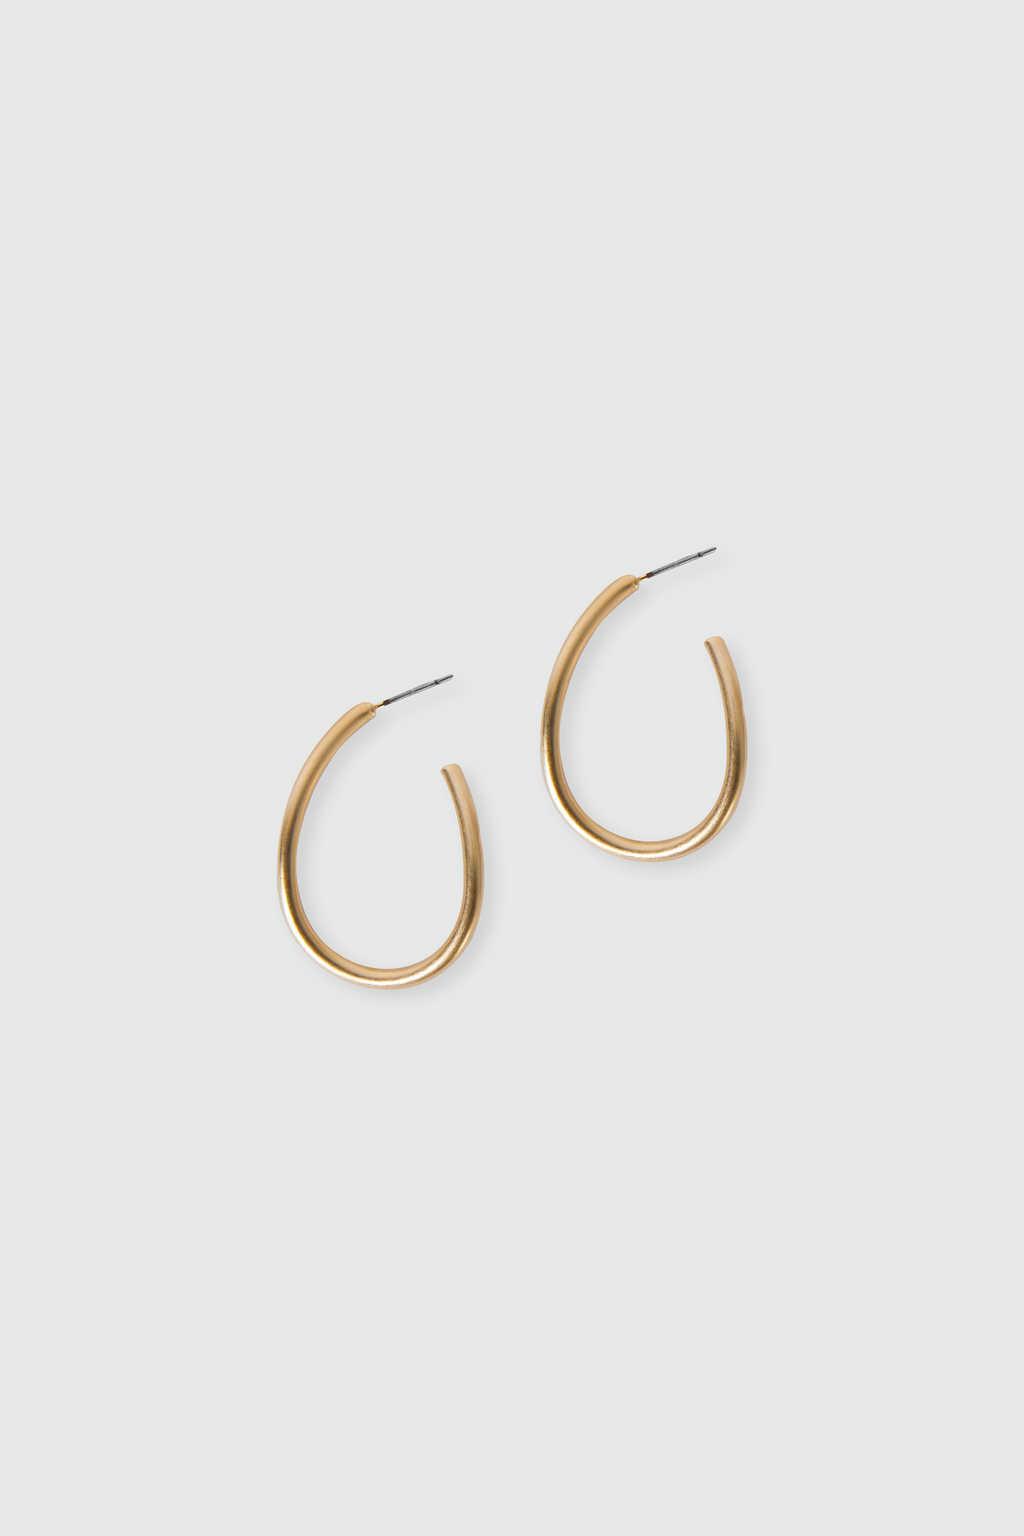 Earring J014 Gold 2